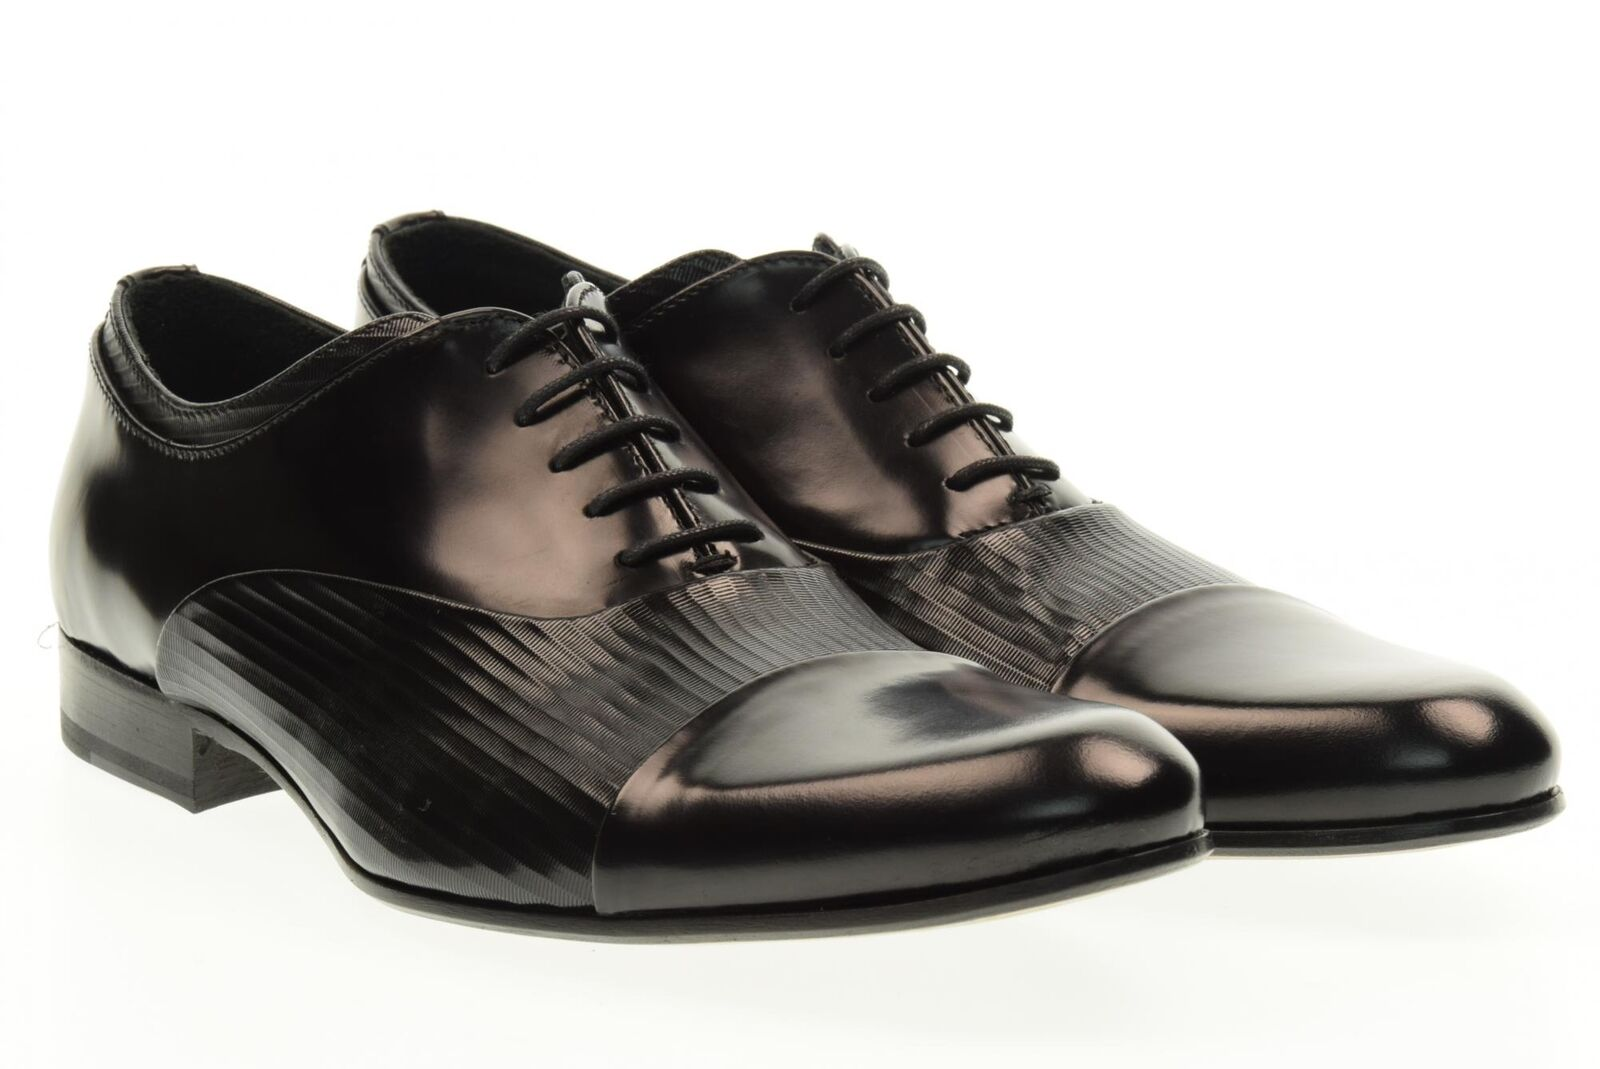 Eveet p17s scarpe uomo merletto - 15910 p -rex linea   nessun minimo